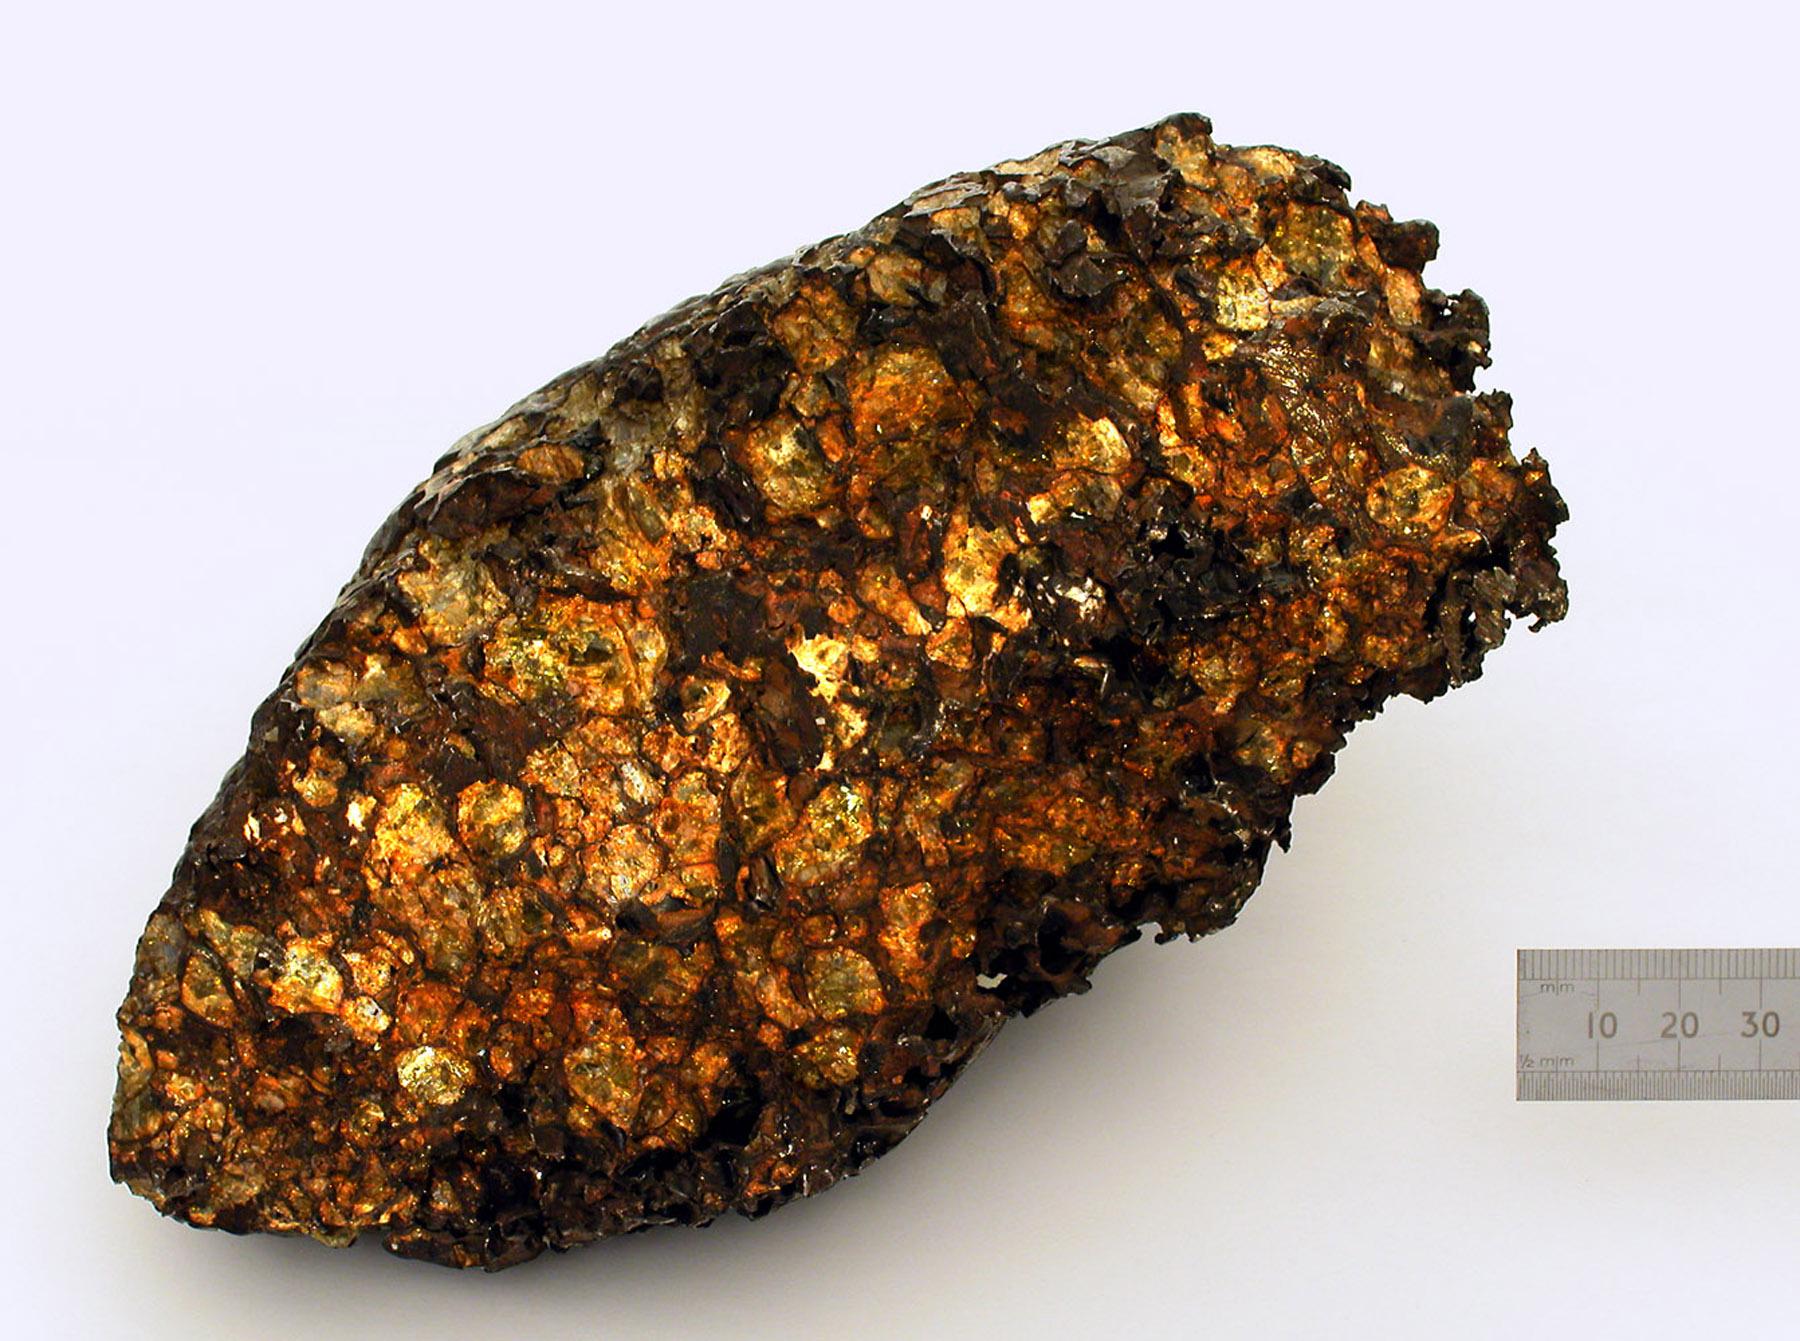 Meteorite victims